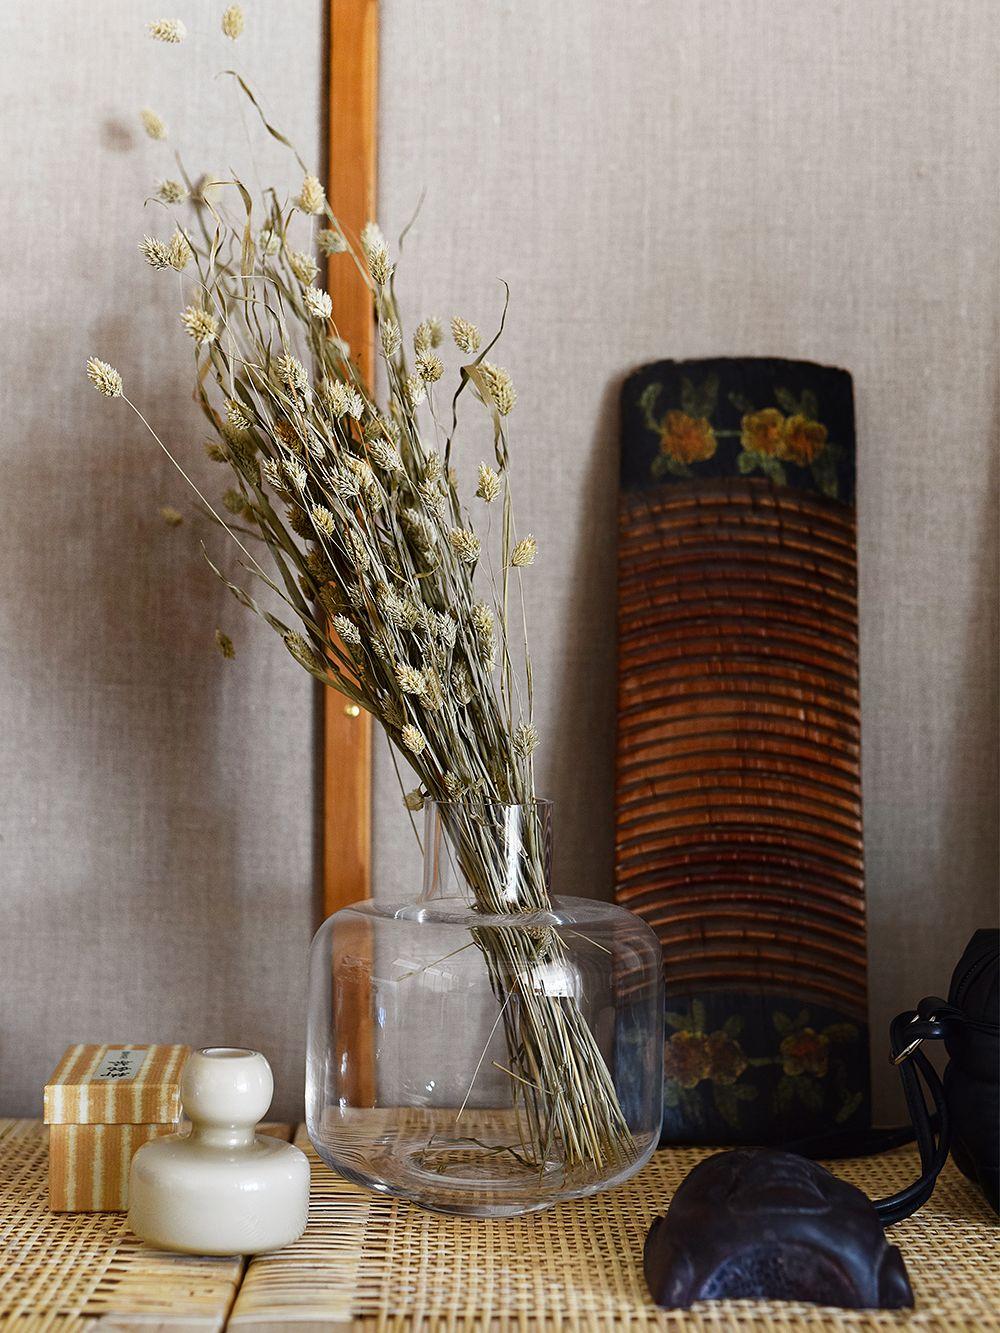 Marimekko's translucent Ming vase and grey Flower vase on a sidetable.